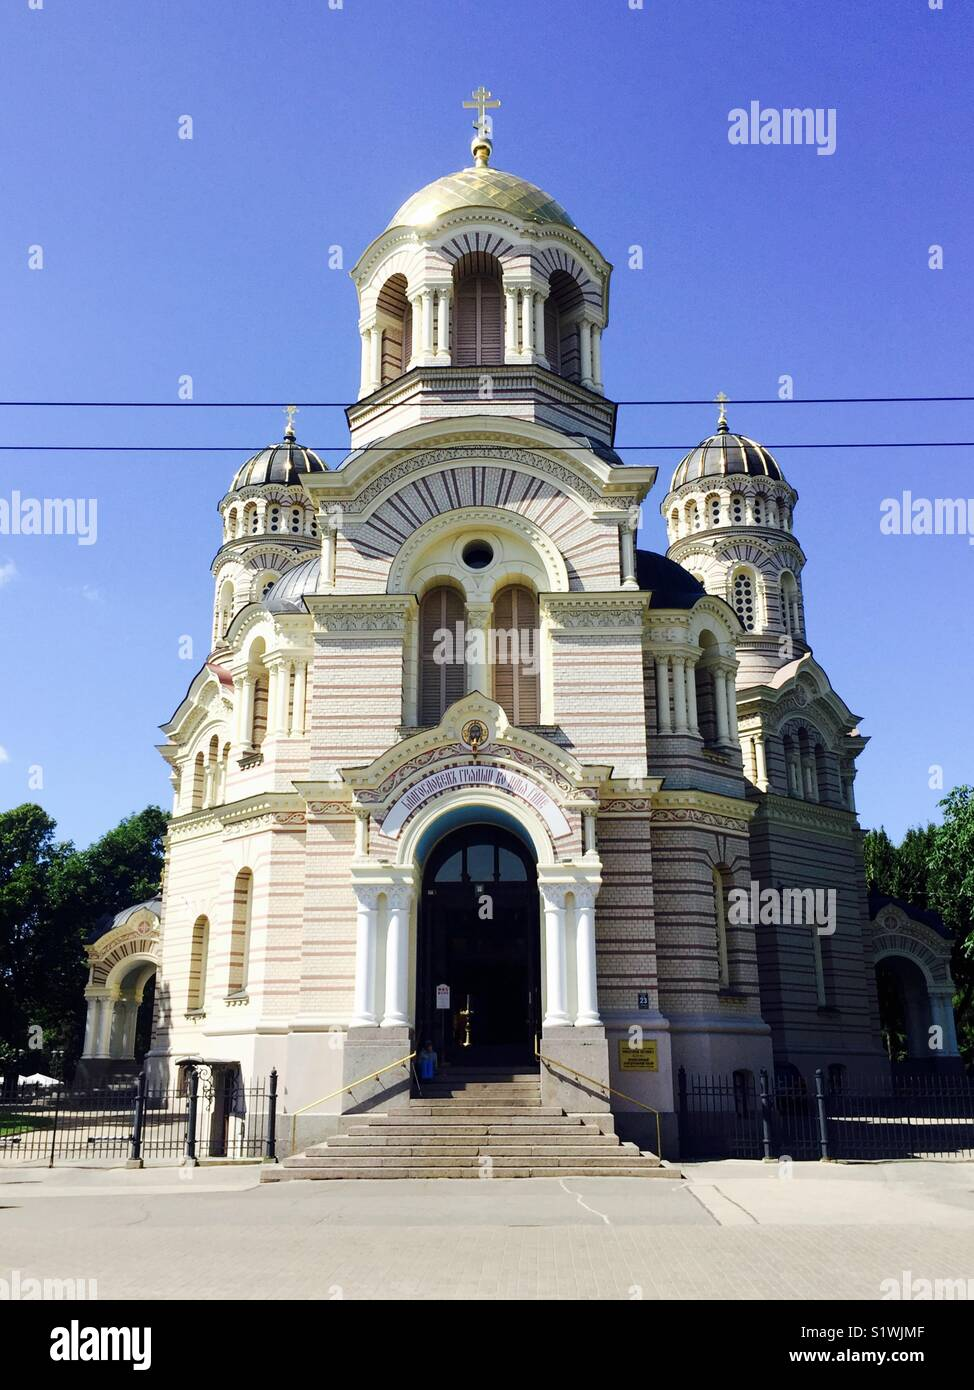 Secessionist chapel in Riga (capitol of Latvia). Whole Riga city is on UNESCO heritatge list. Stock Photo